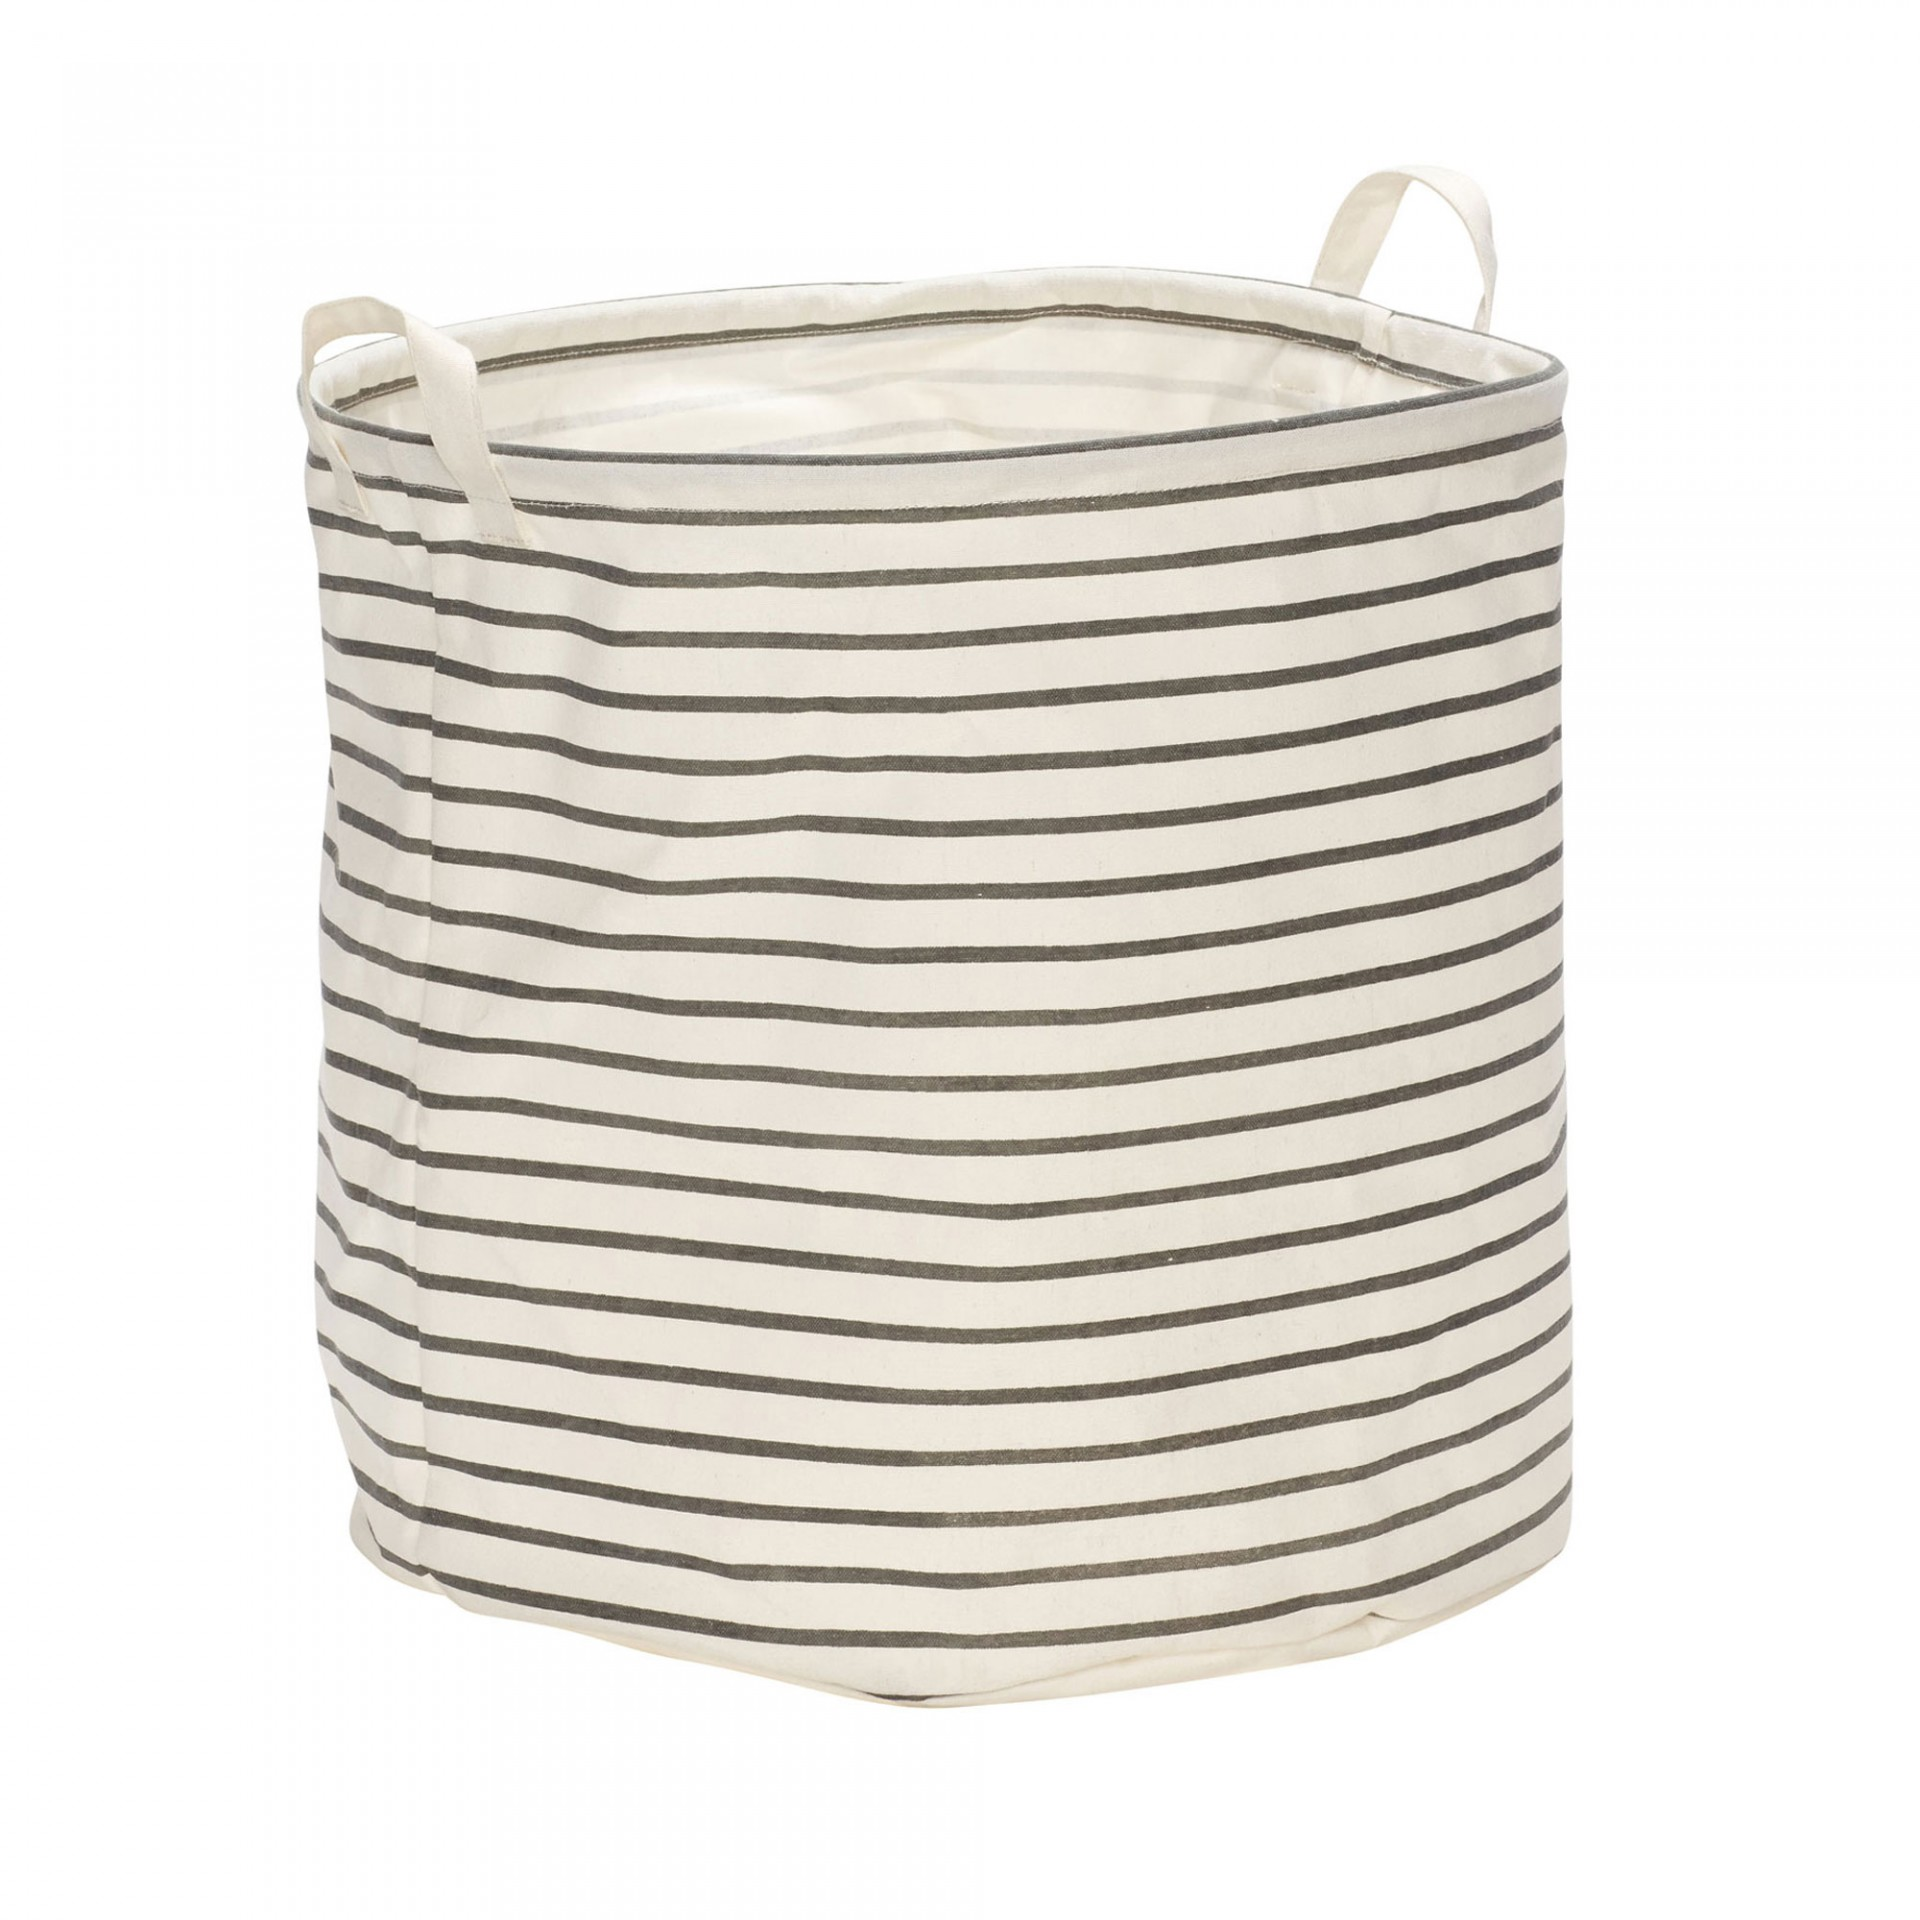 Cesto de roupa c/alças, branco/cinza, Ø40x40